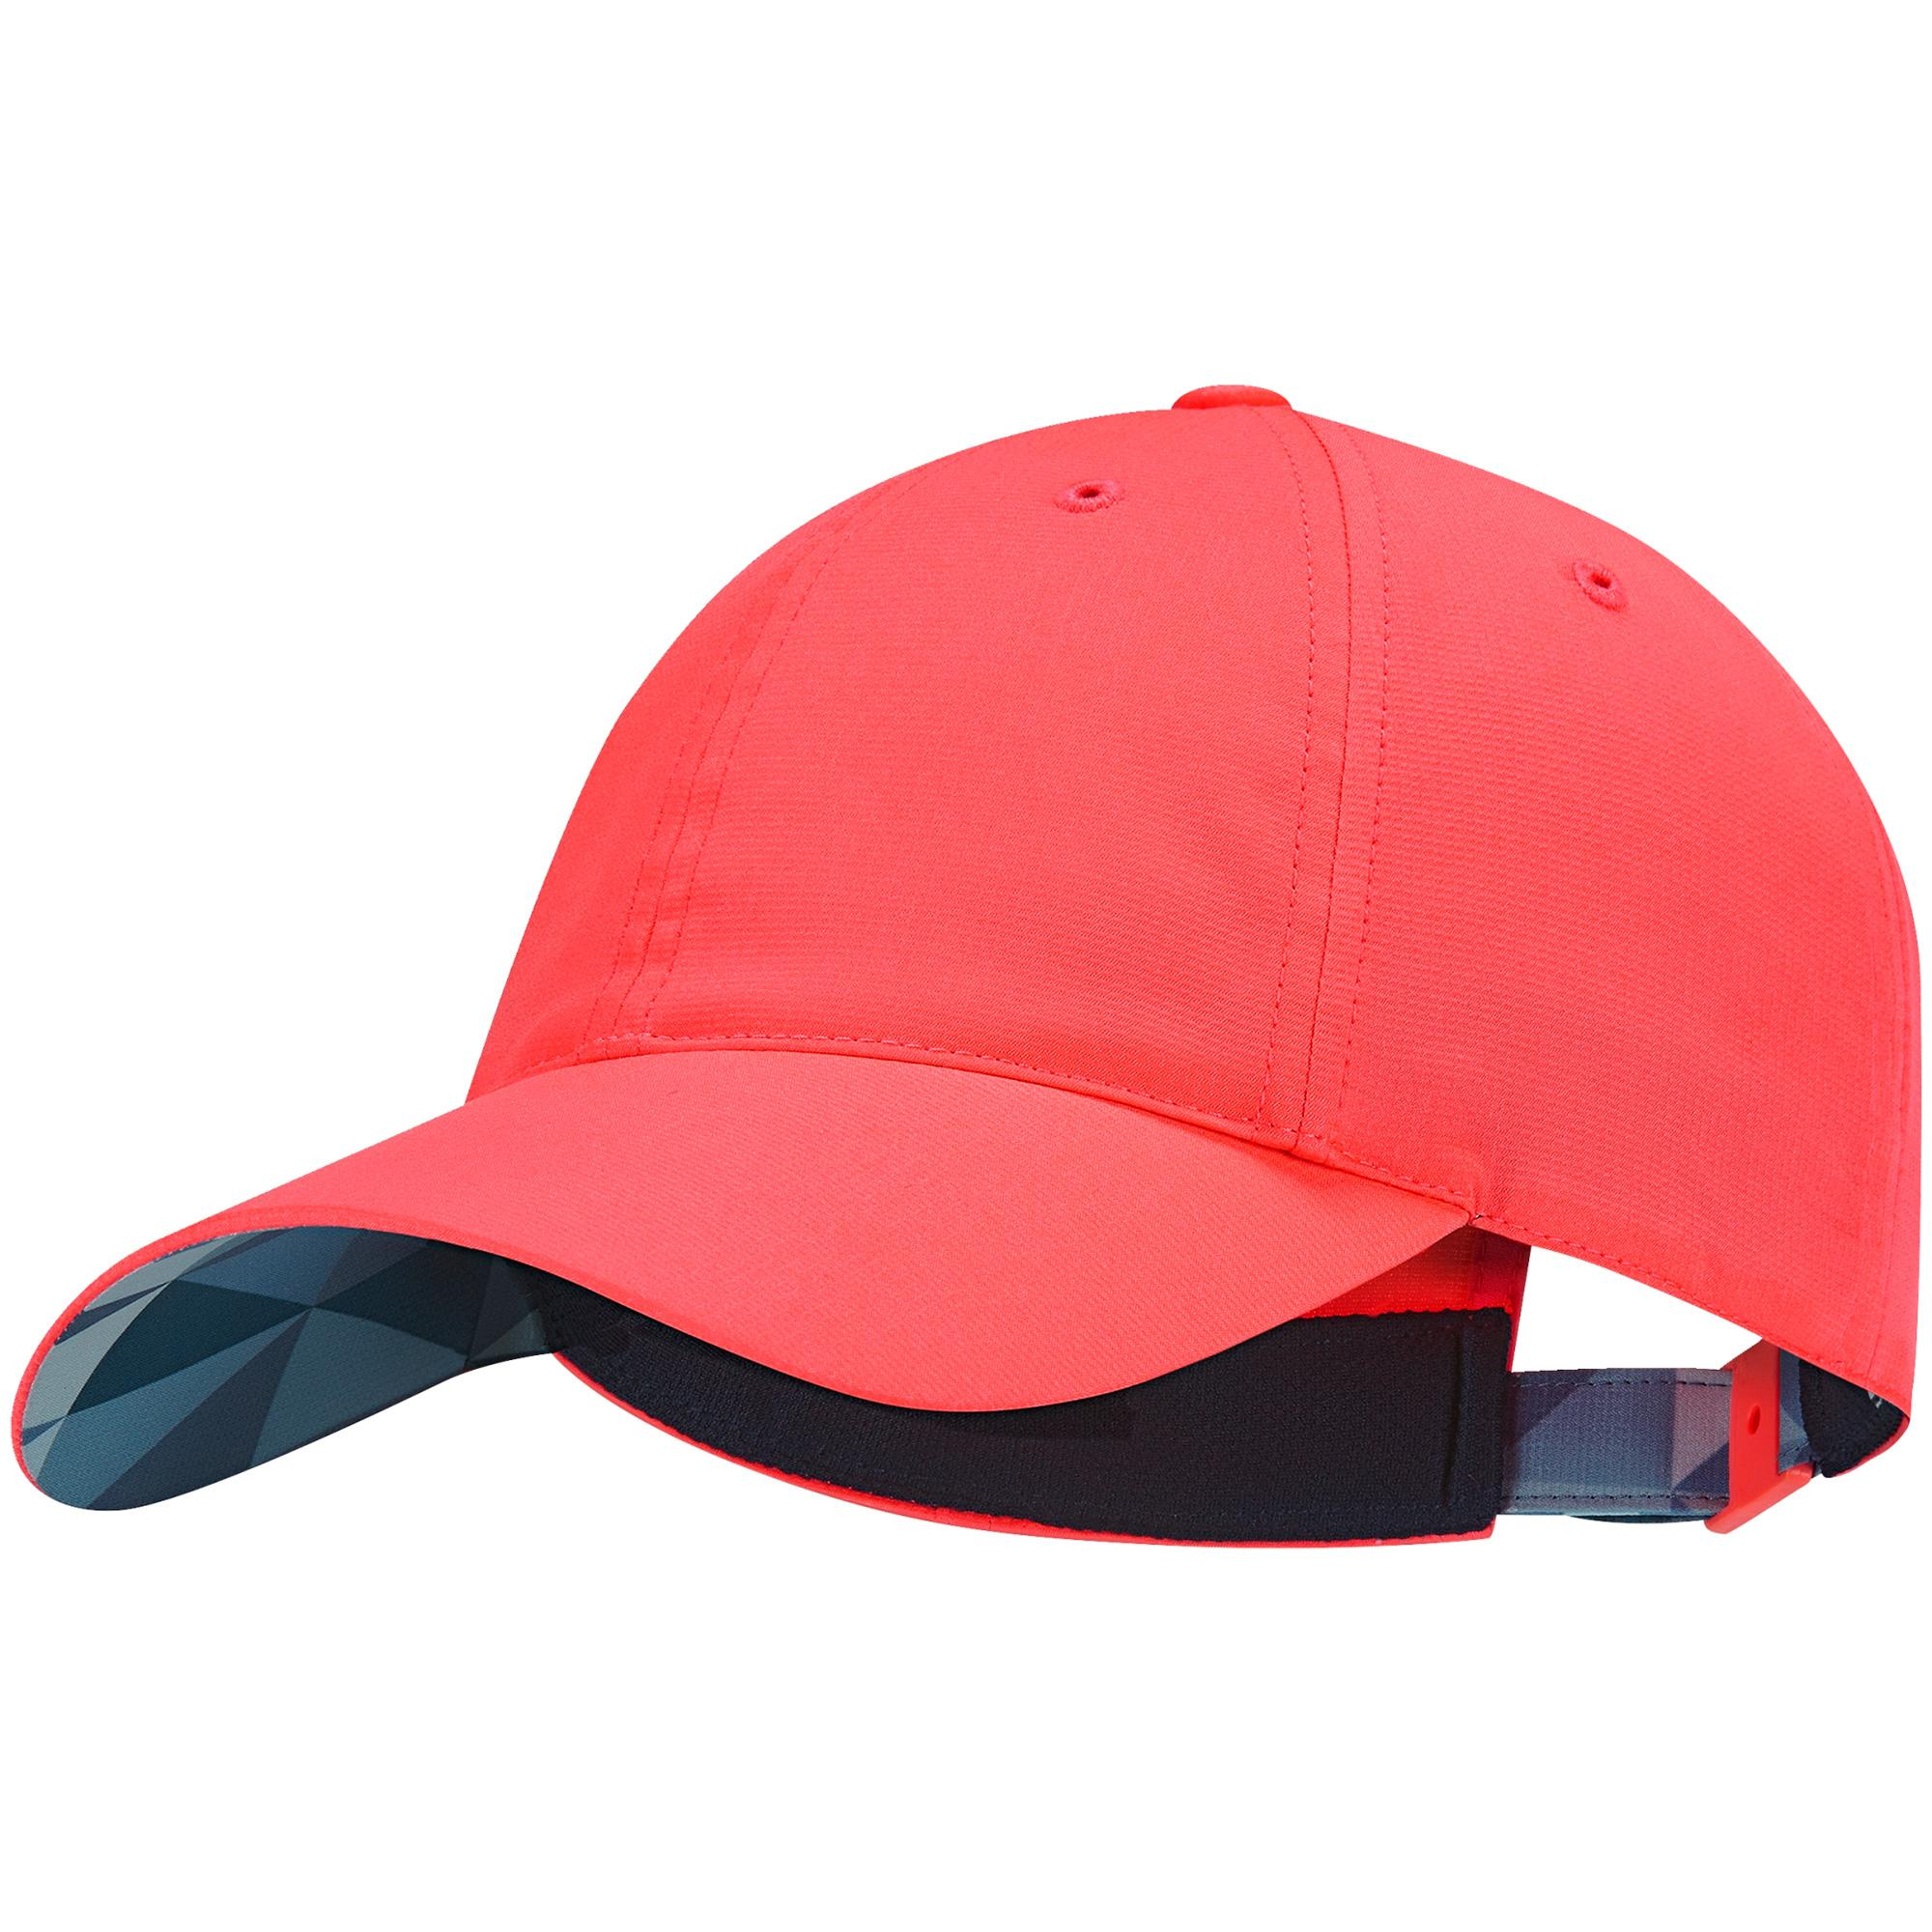 a170f66beb Adidas Tennis Cap - Flash Red - Tennisnuts.com